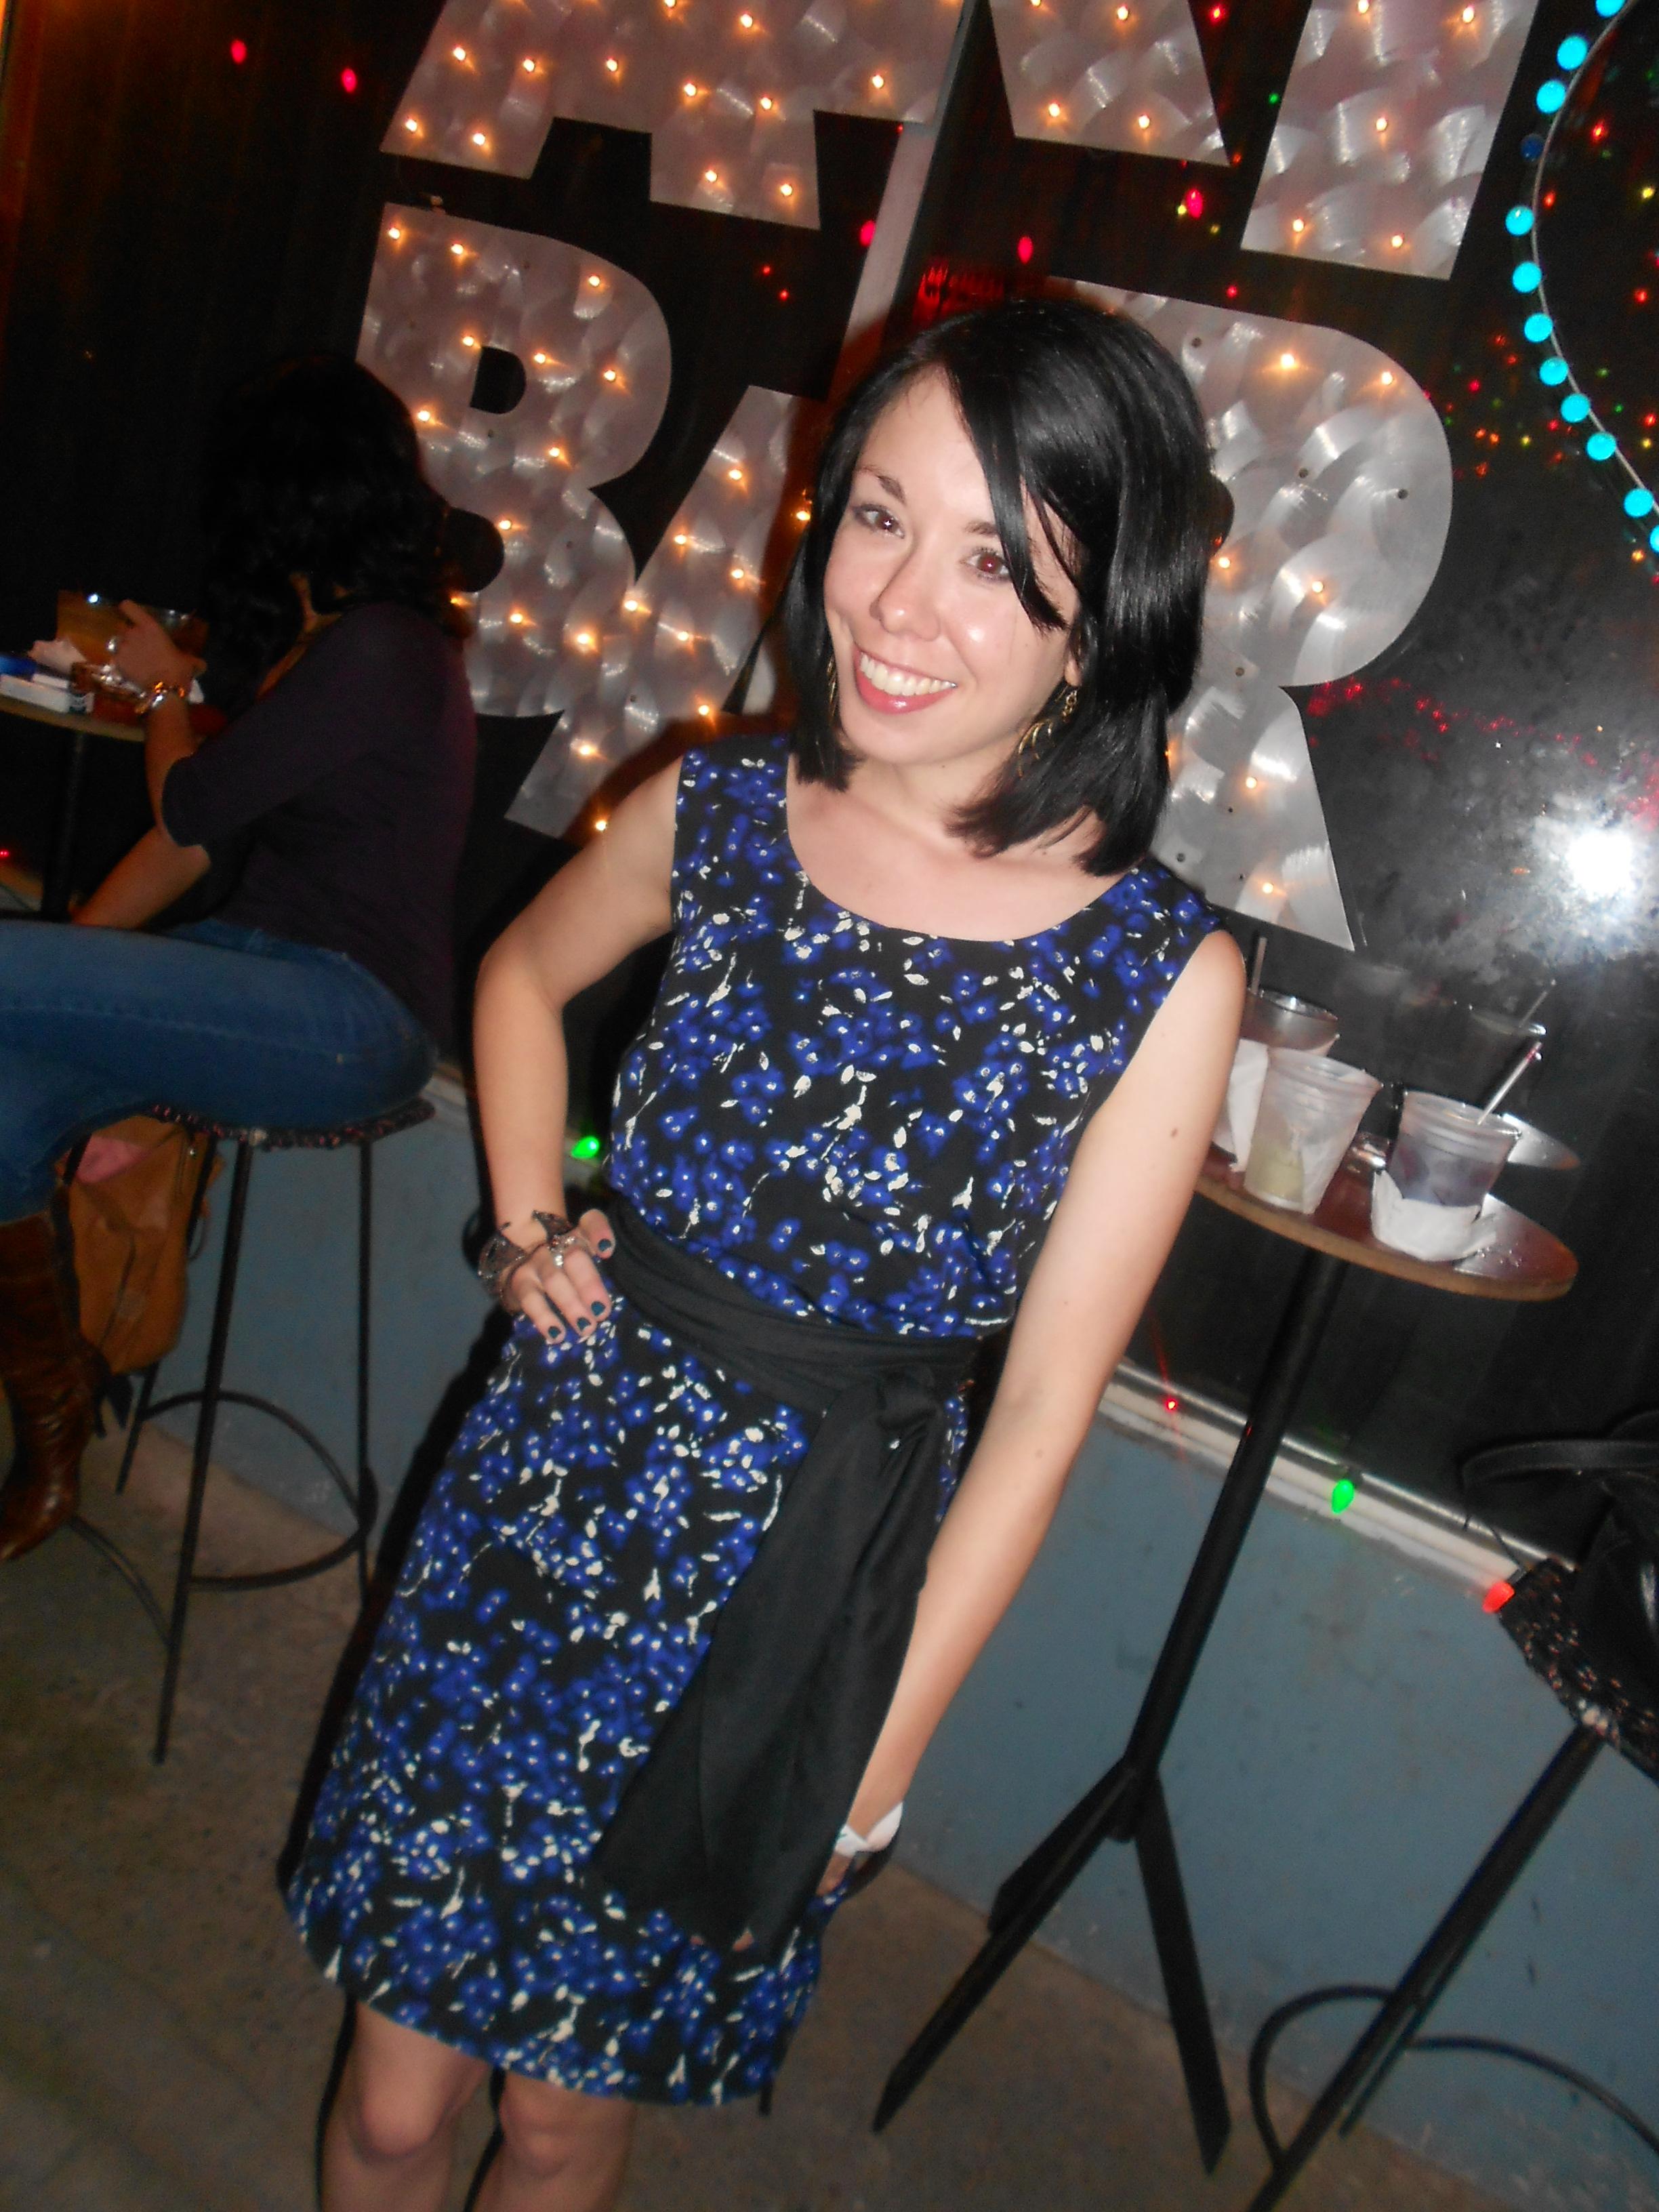 Day 267: Jackson Pollock Dress 8